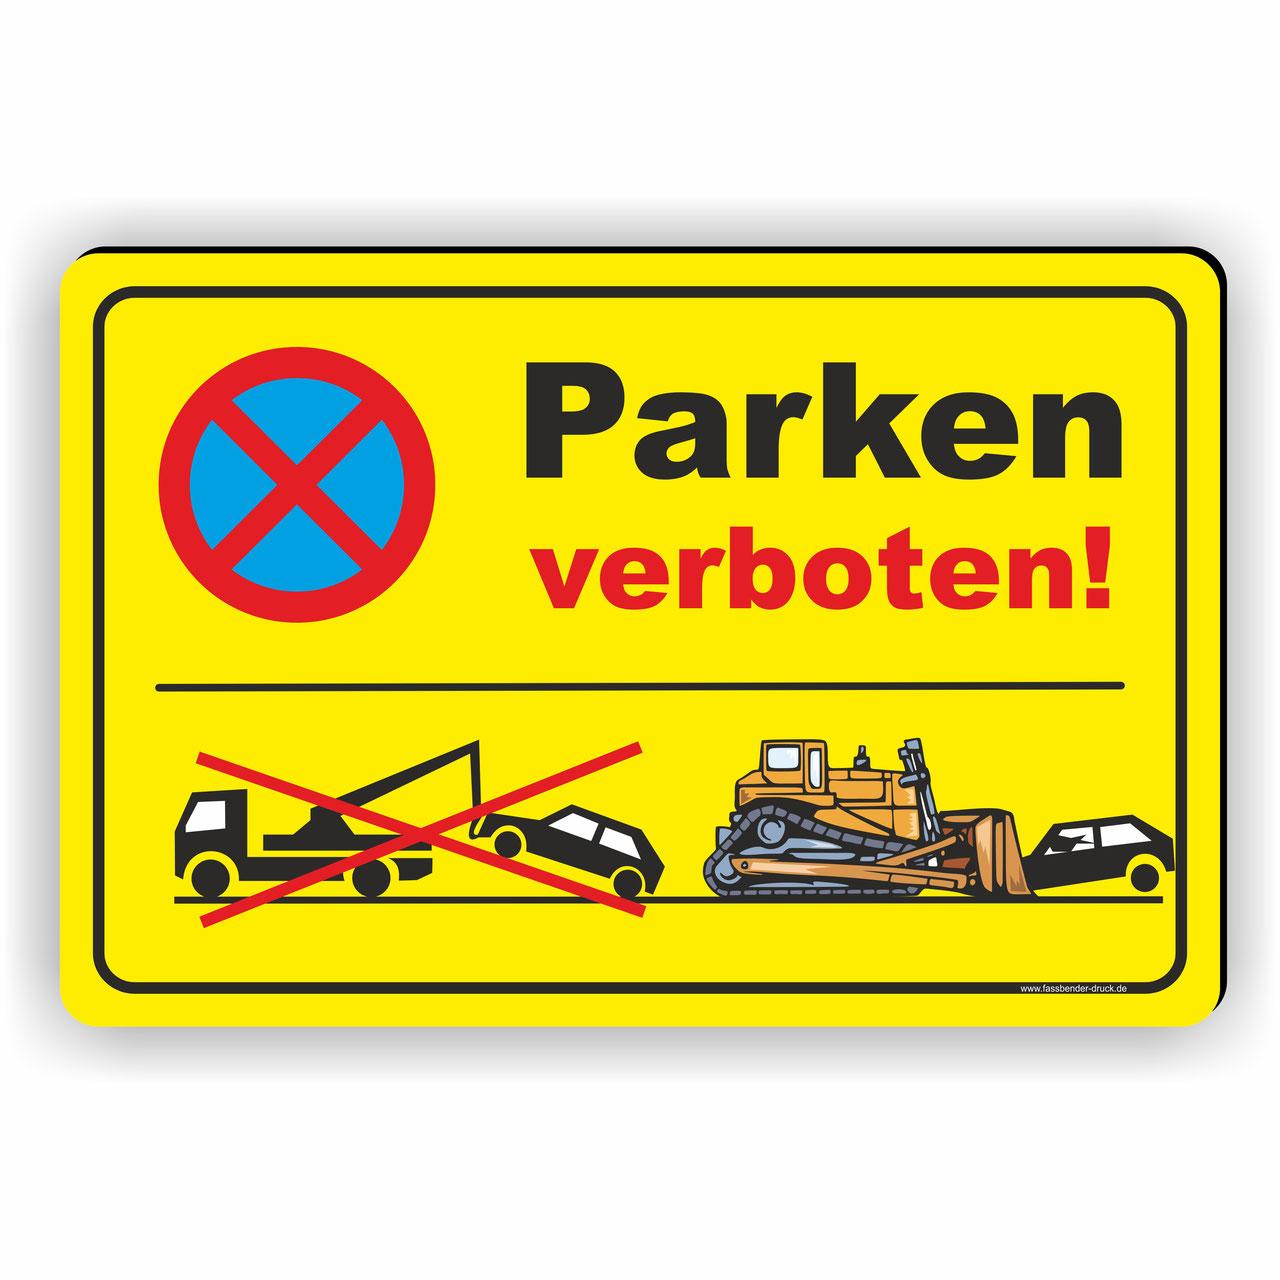 parkverbotsschild parkverbotsschilder privatparkplatz legden fassbender druck. Black Bedroom Furniture Sets. Home Design Ideas